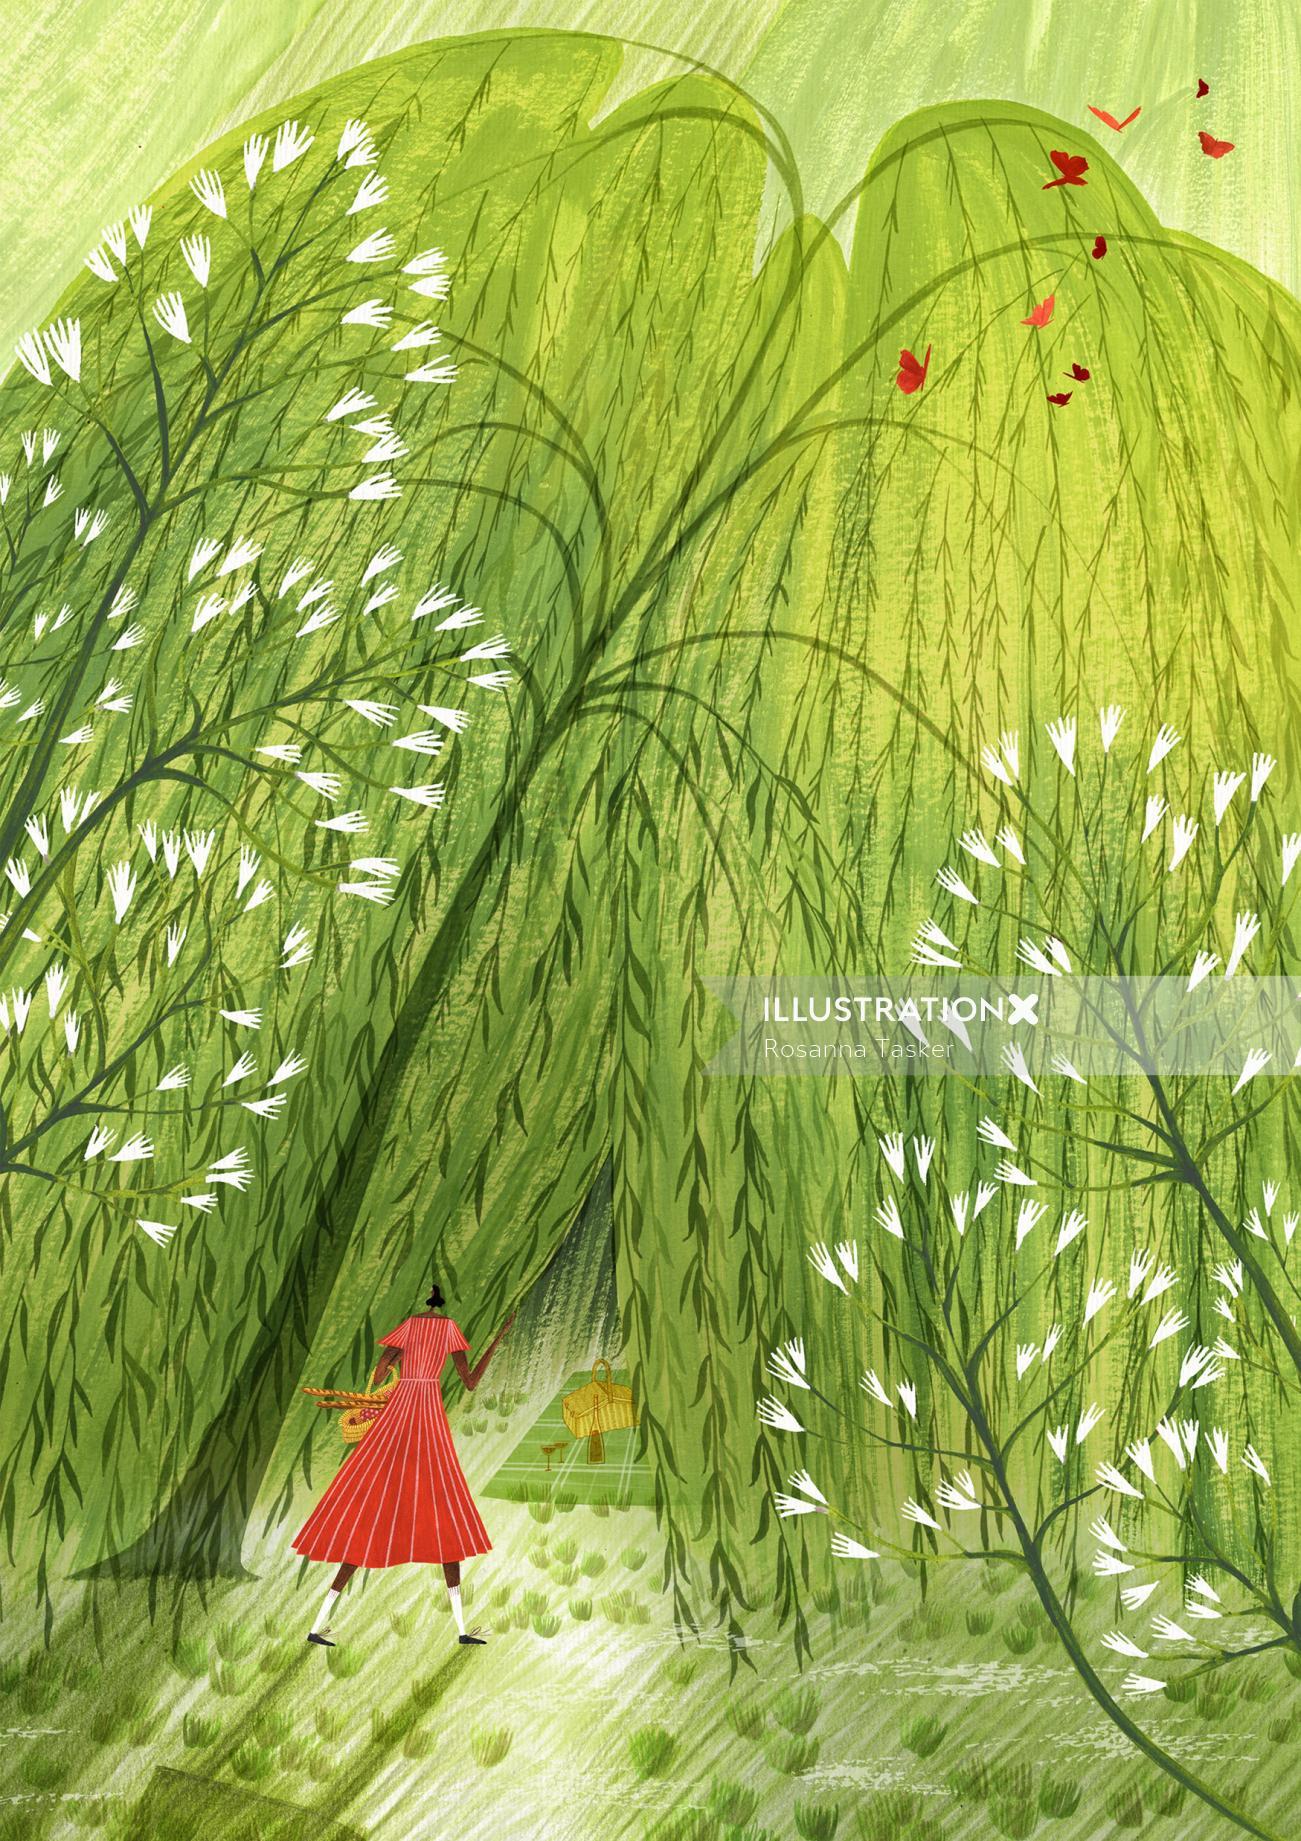 willow, tree, picnic, food, drink, summer, spring, calendar, season, sun, sunshine, warm, dress